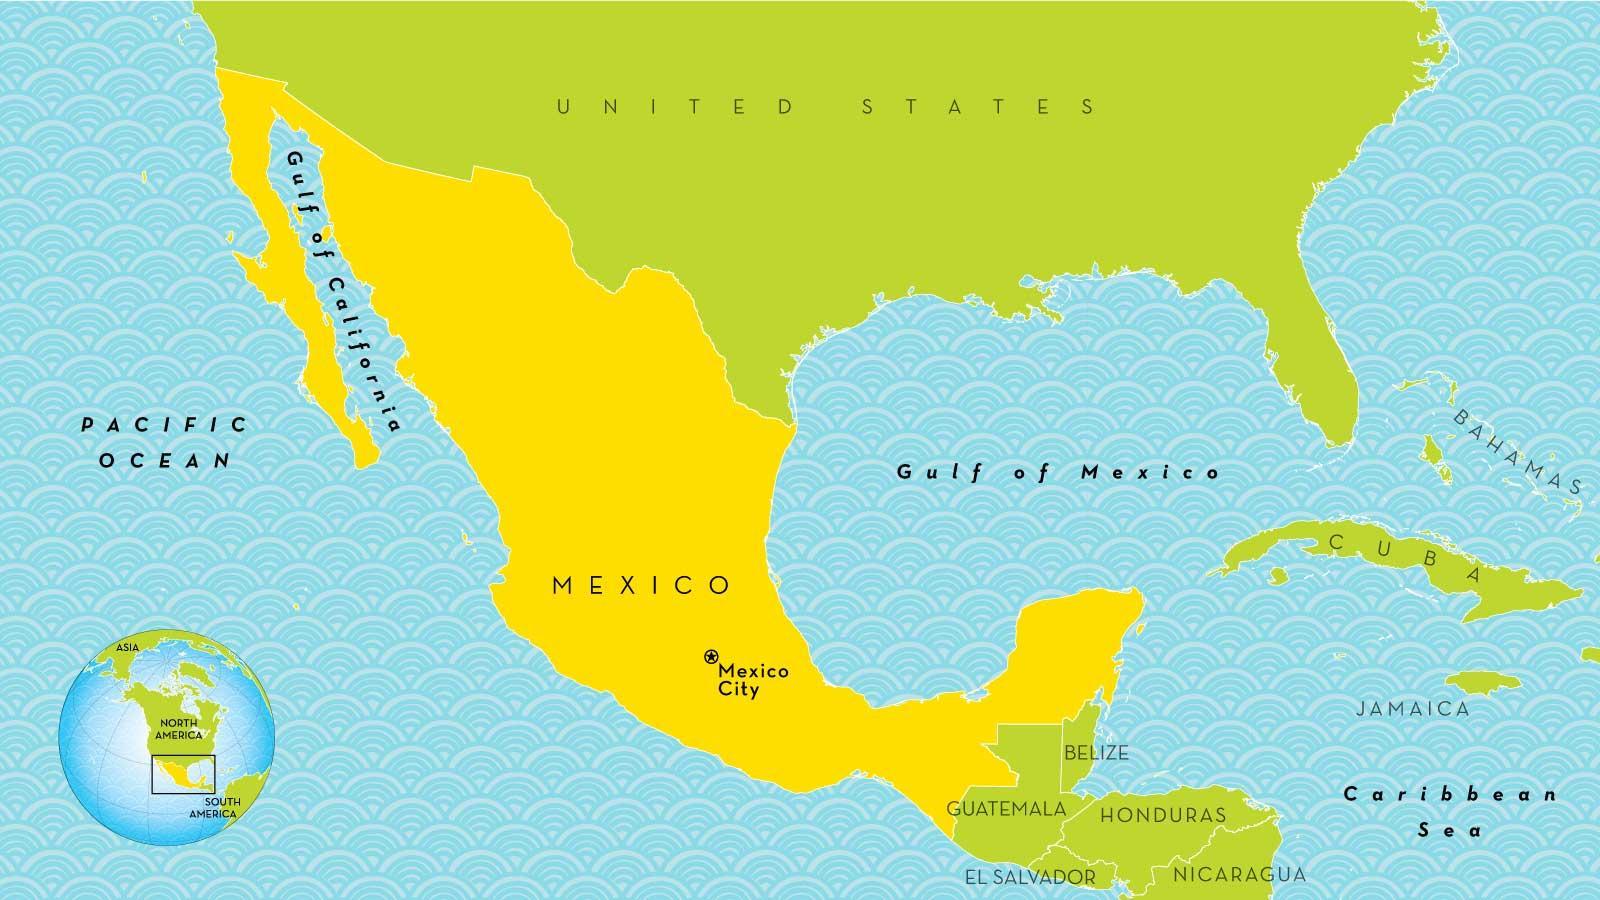 Mexico City world map - A map of Mexico City (Mexico)